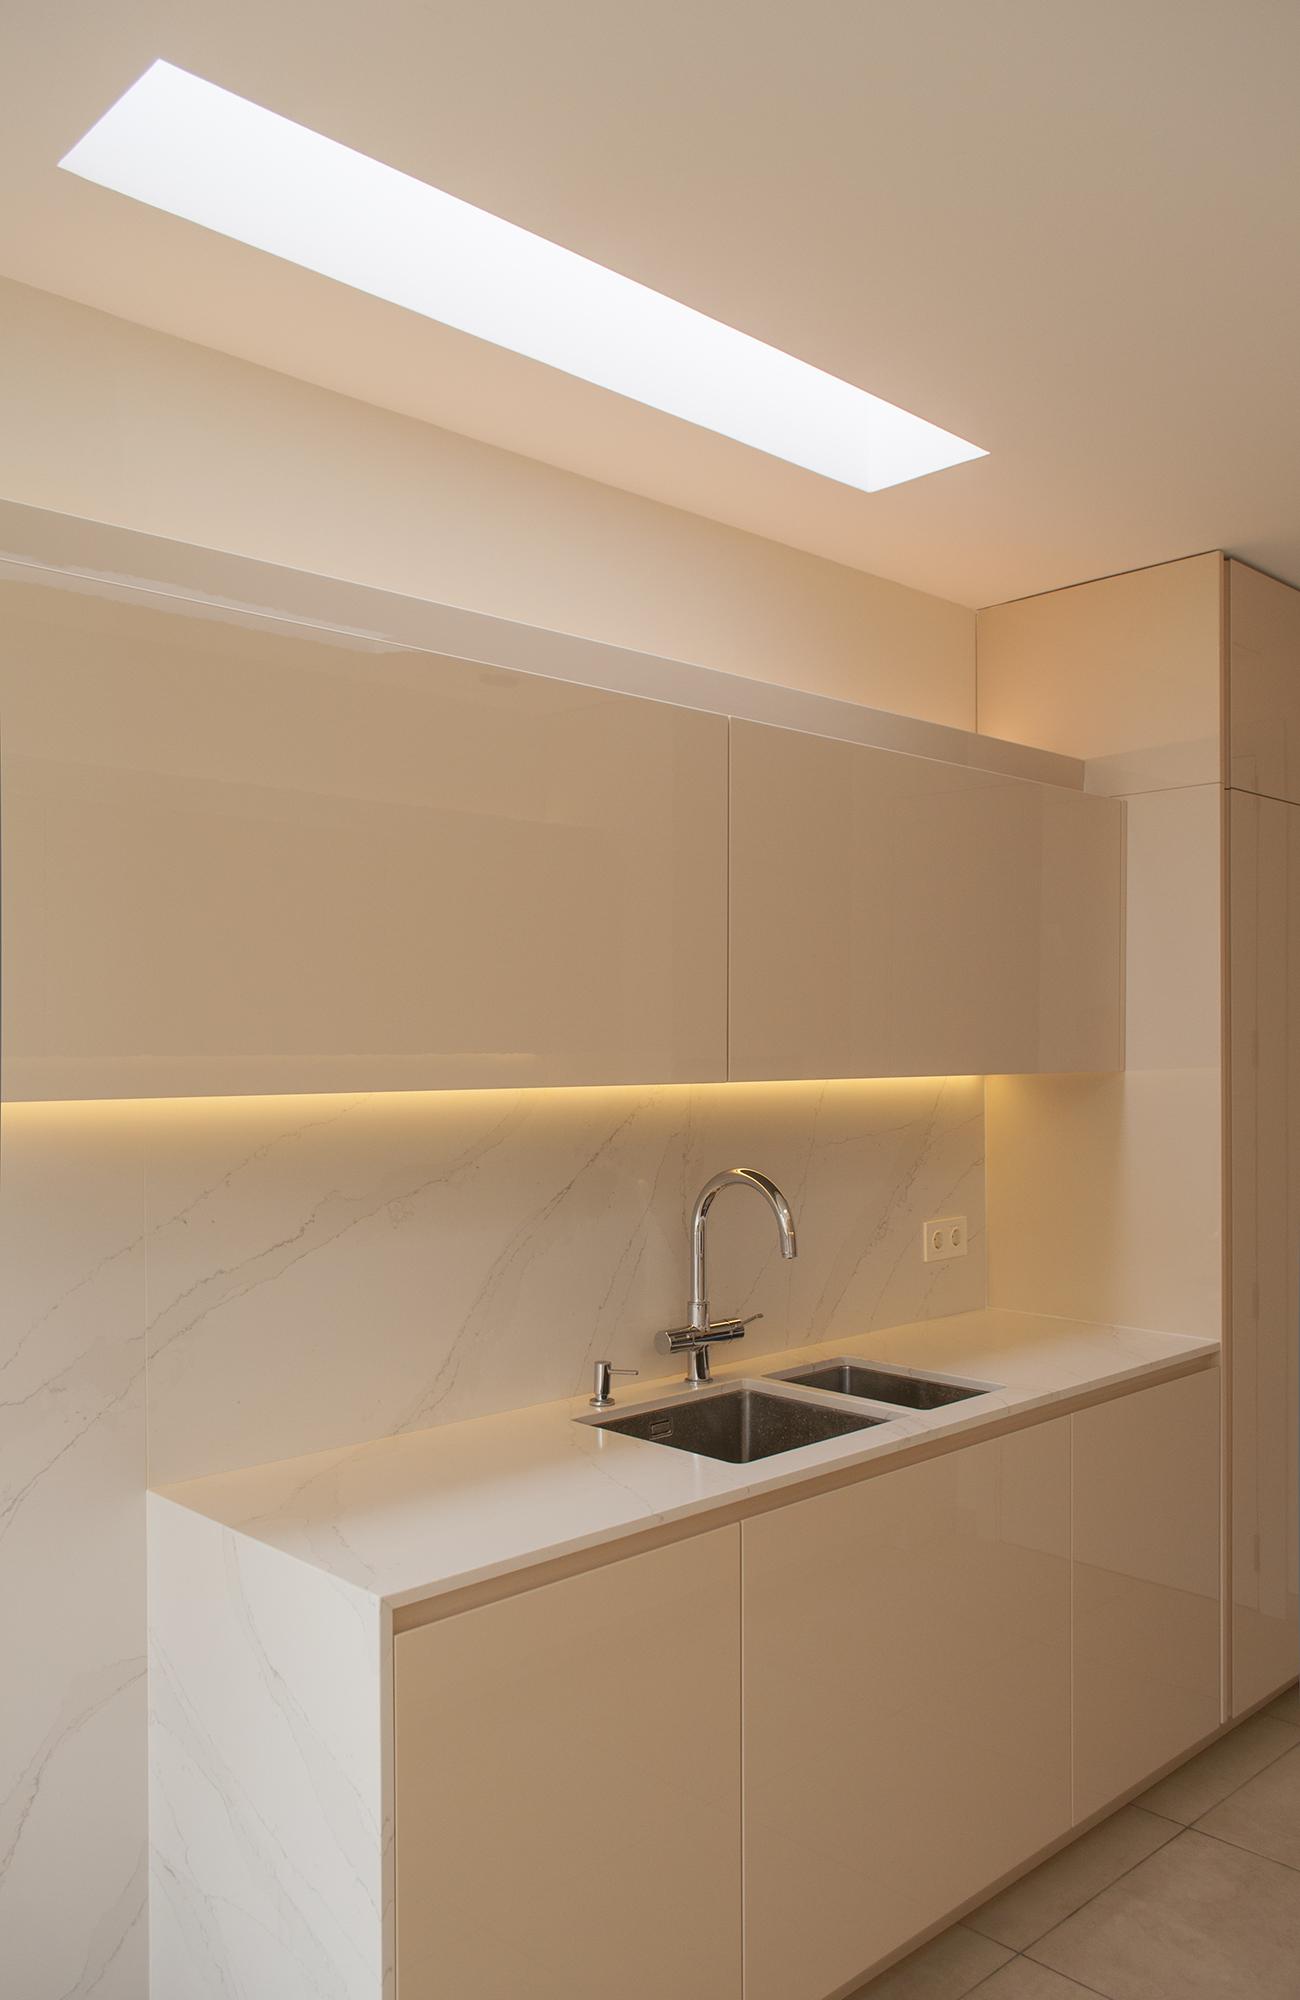 23-rardo-architects-houses-in-sitges-kitchen